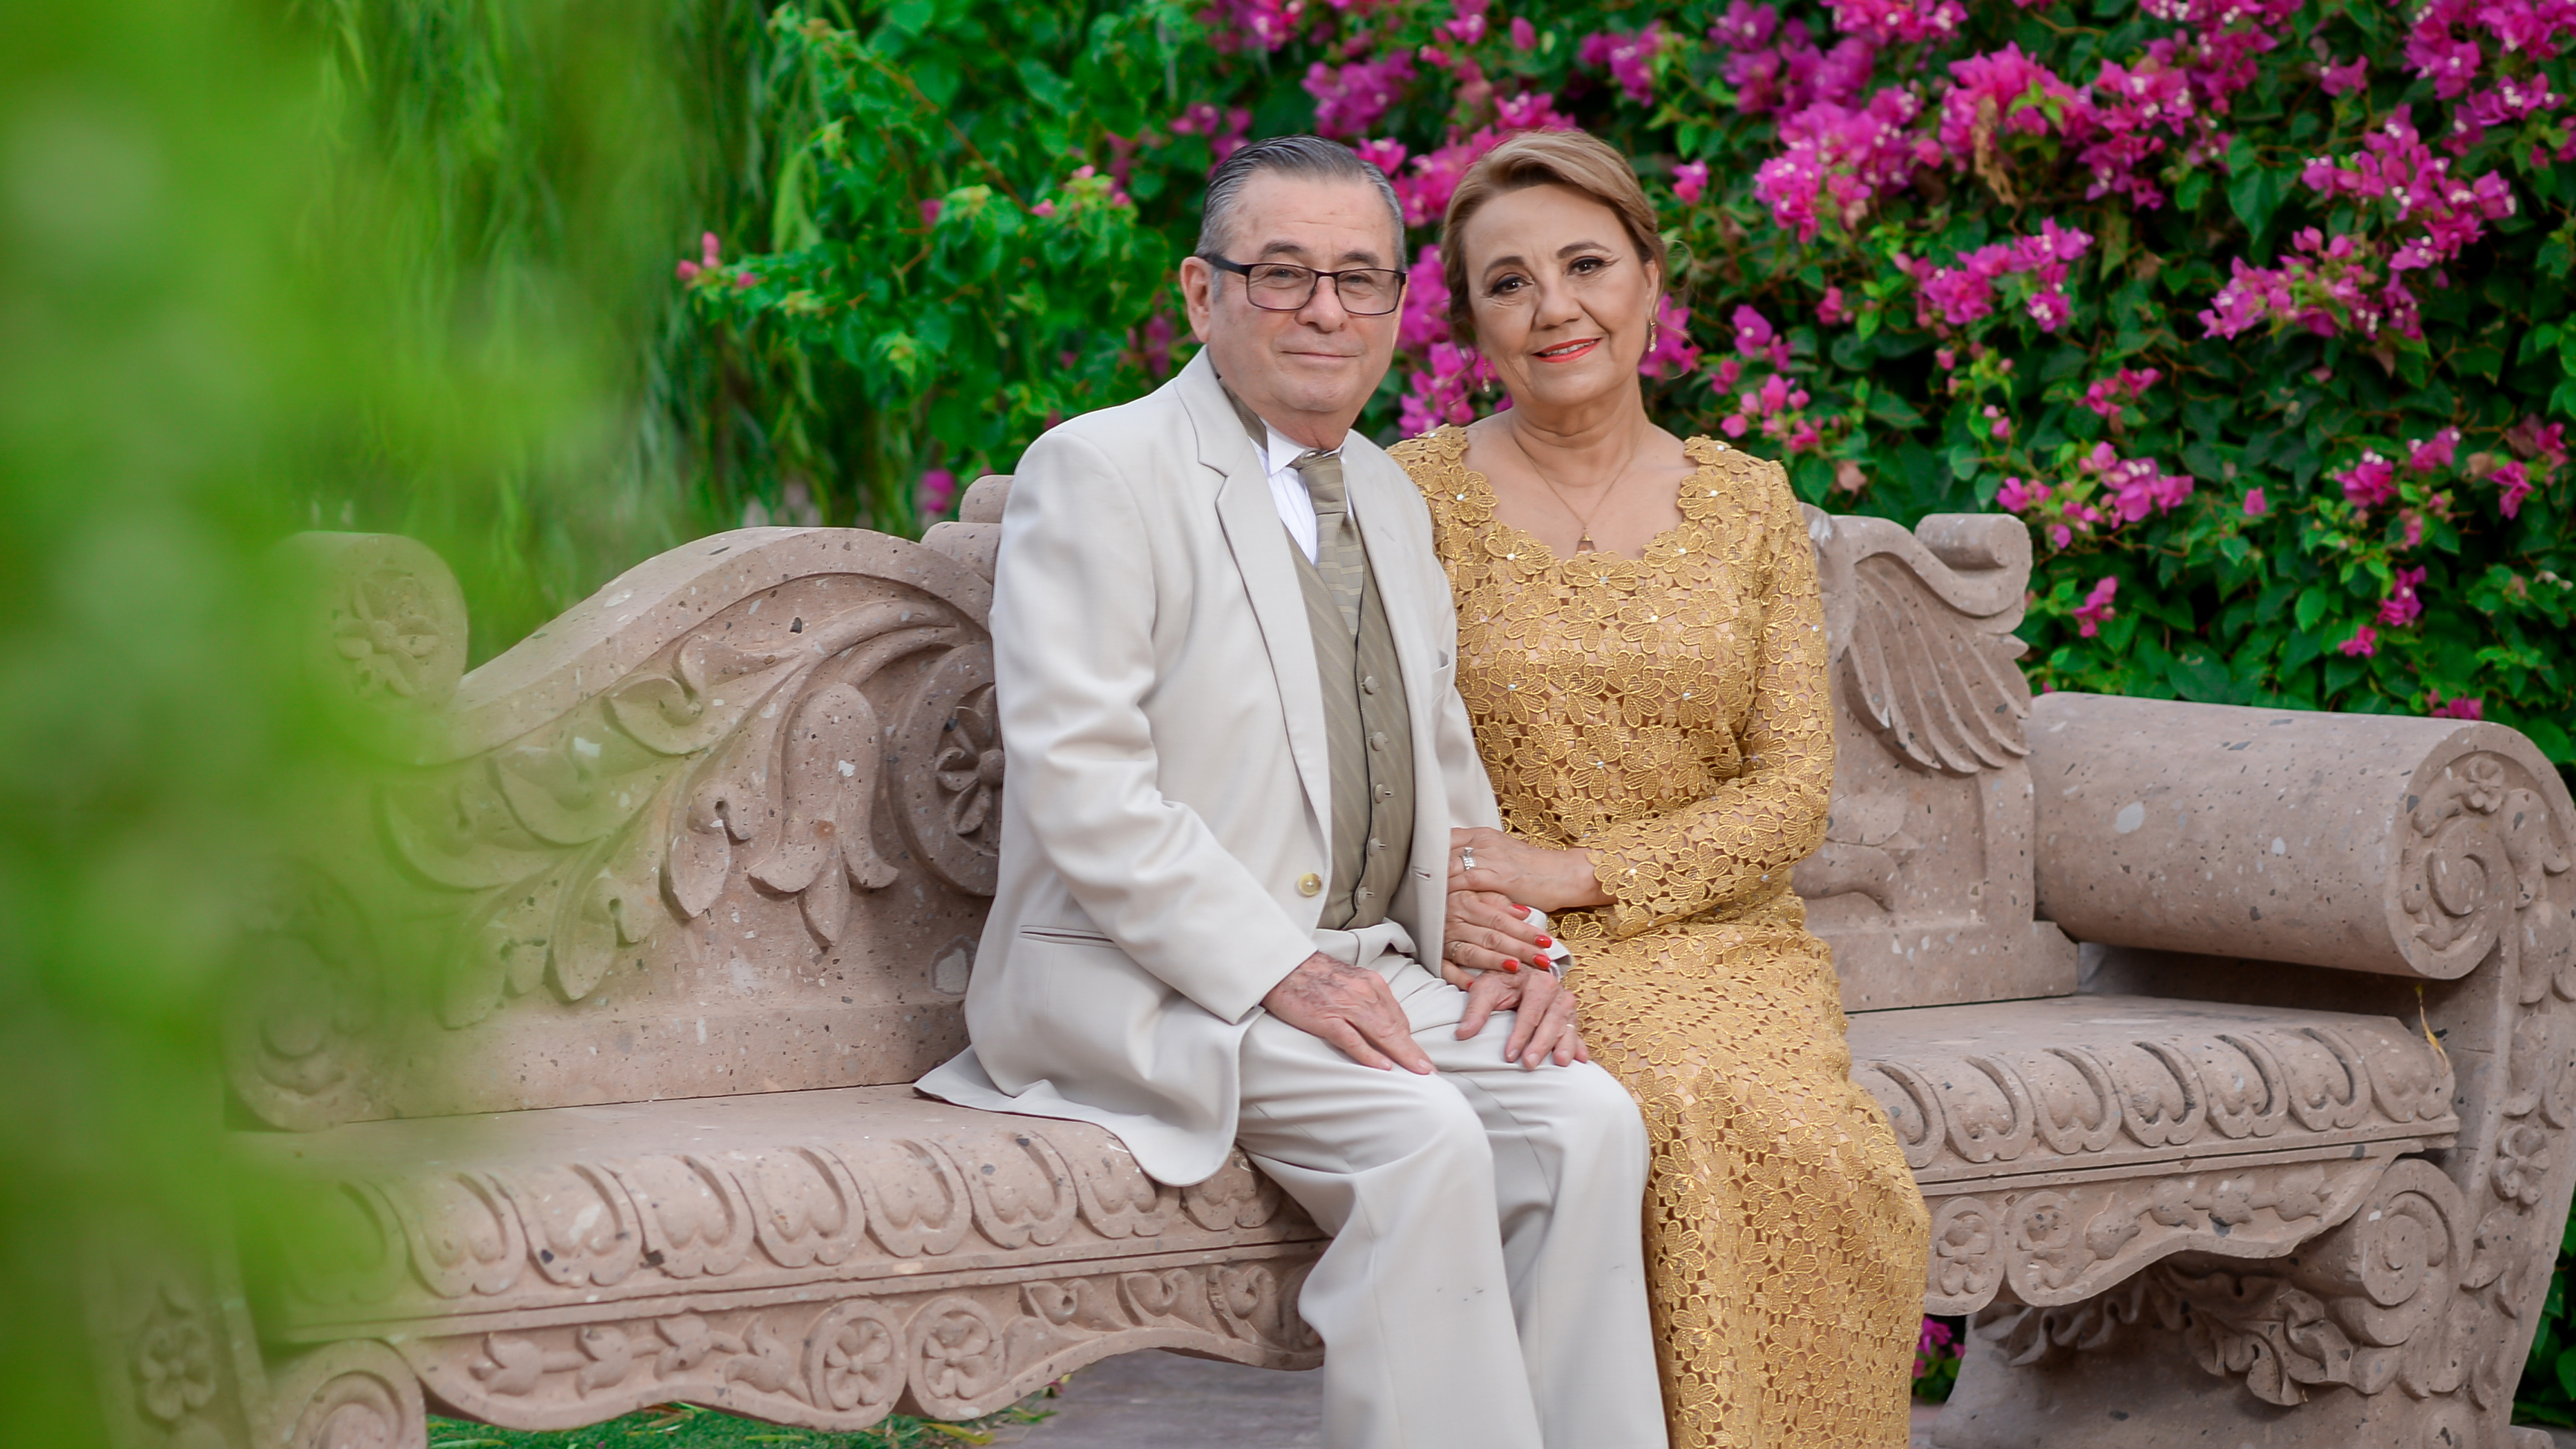 Silvestre Pérez y Martha Bustamante de Pérez celebran 50 años de matrimonio